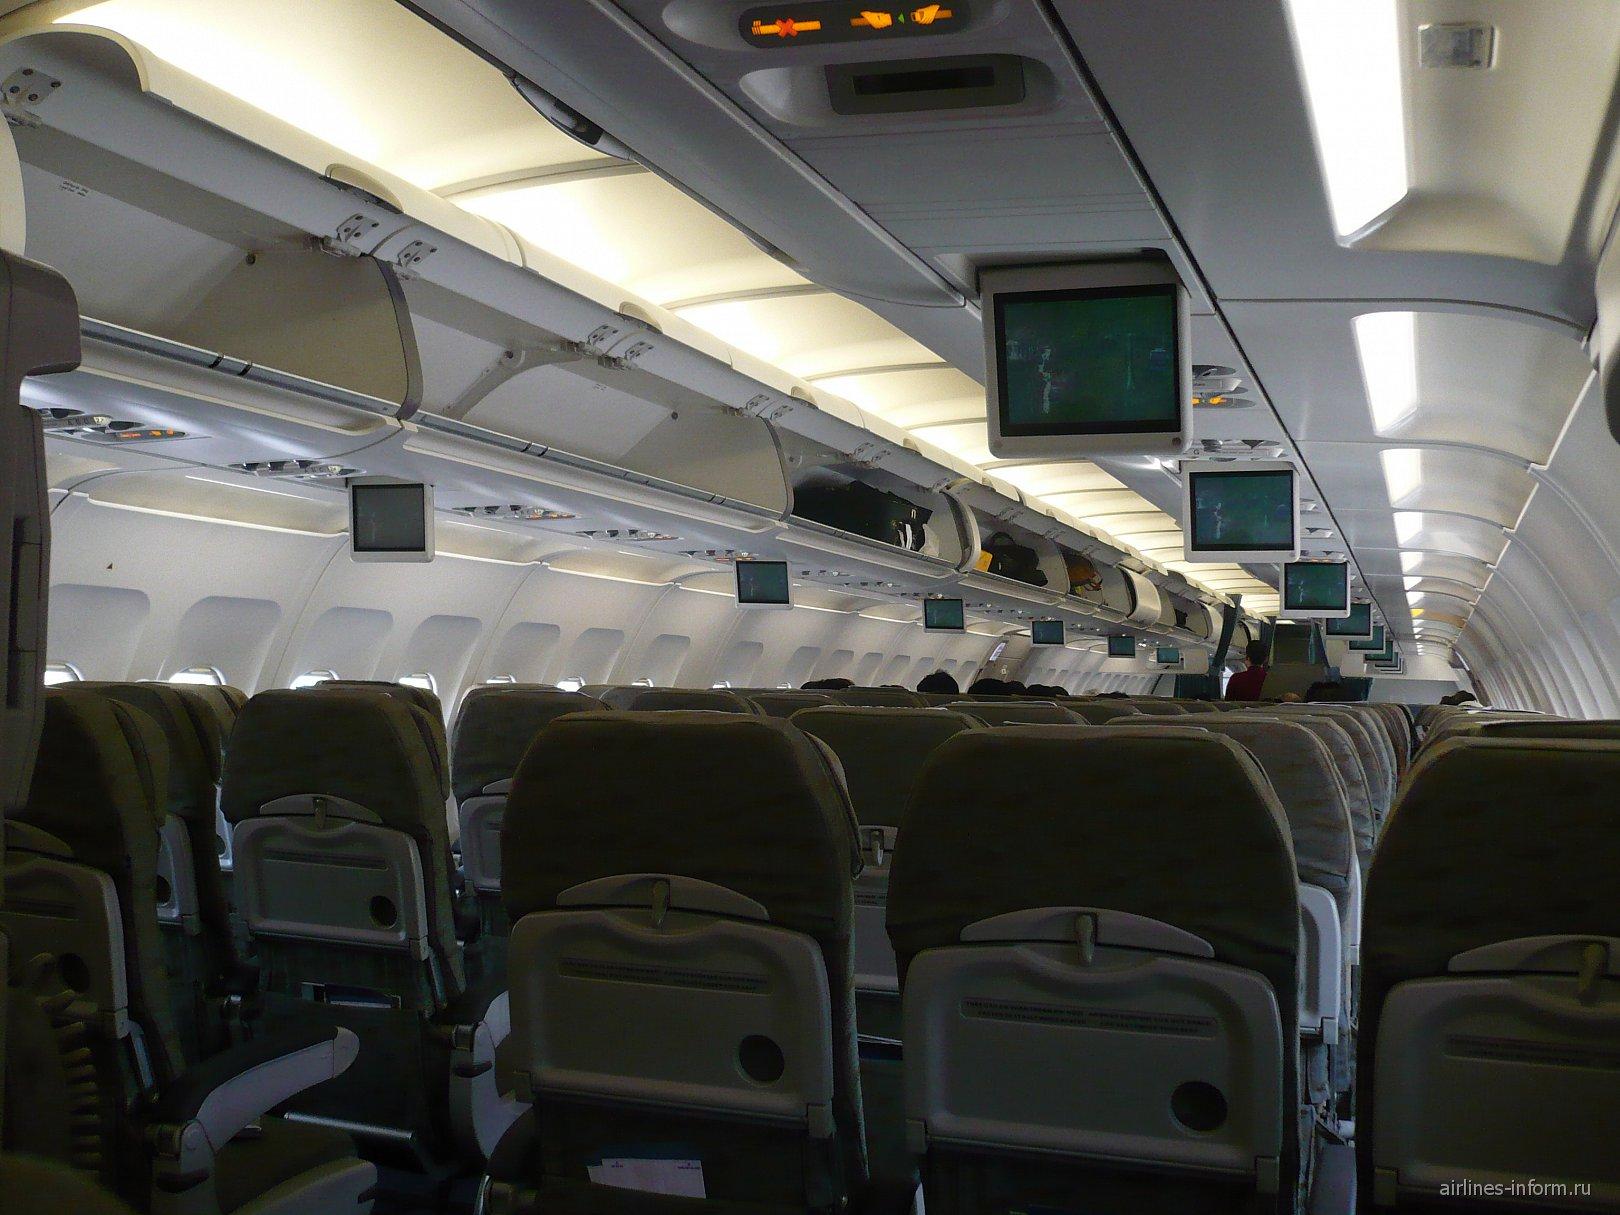 Салон самолета Airbus A321 Вьетнамских авиалиний